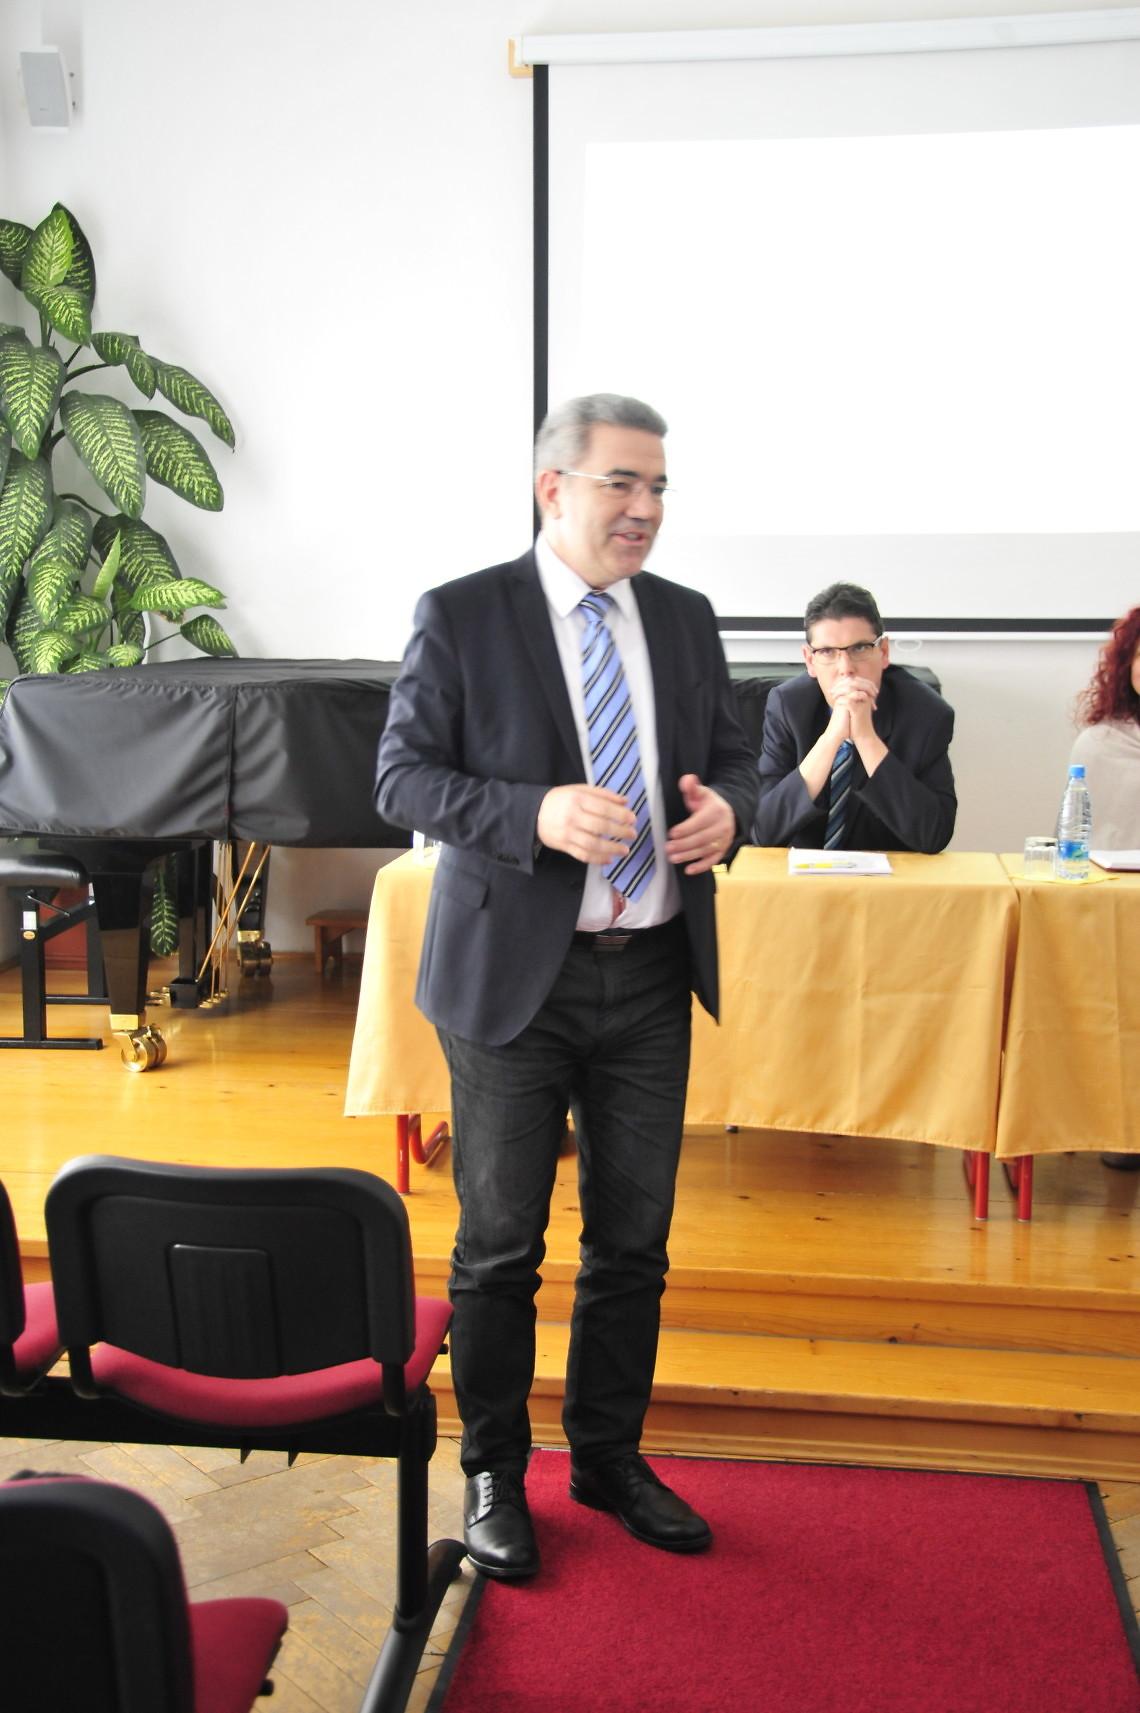 Marko Vatovec, dekan Akademije za glasbo